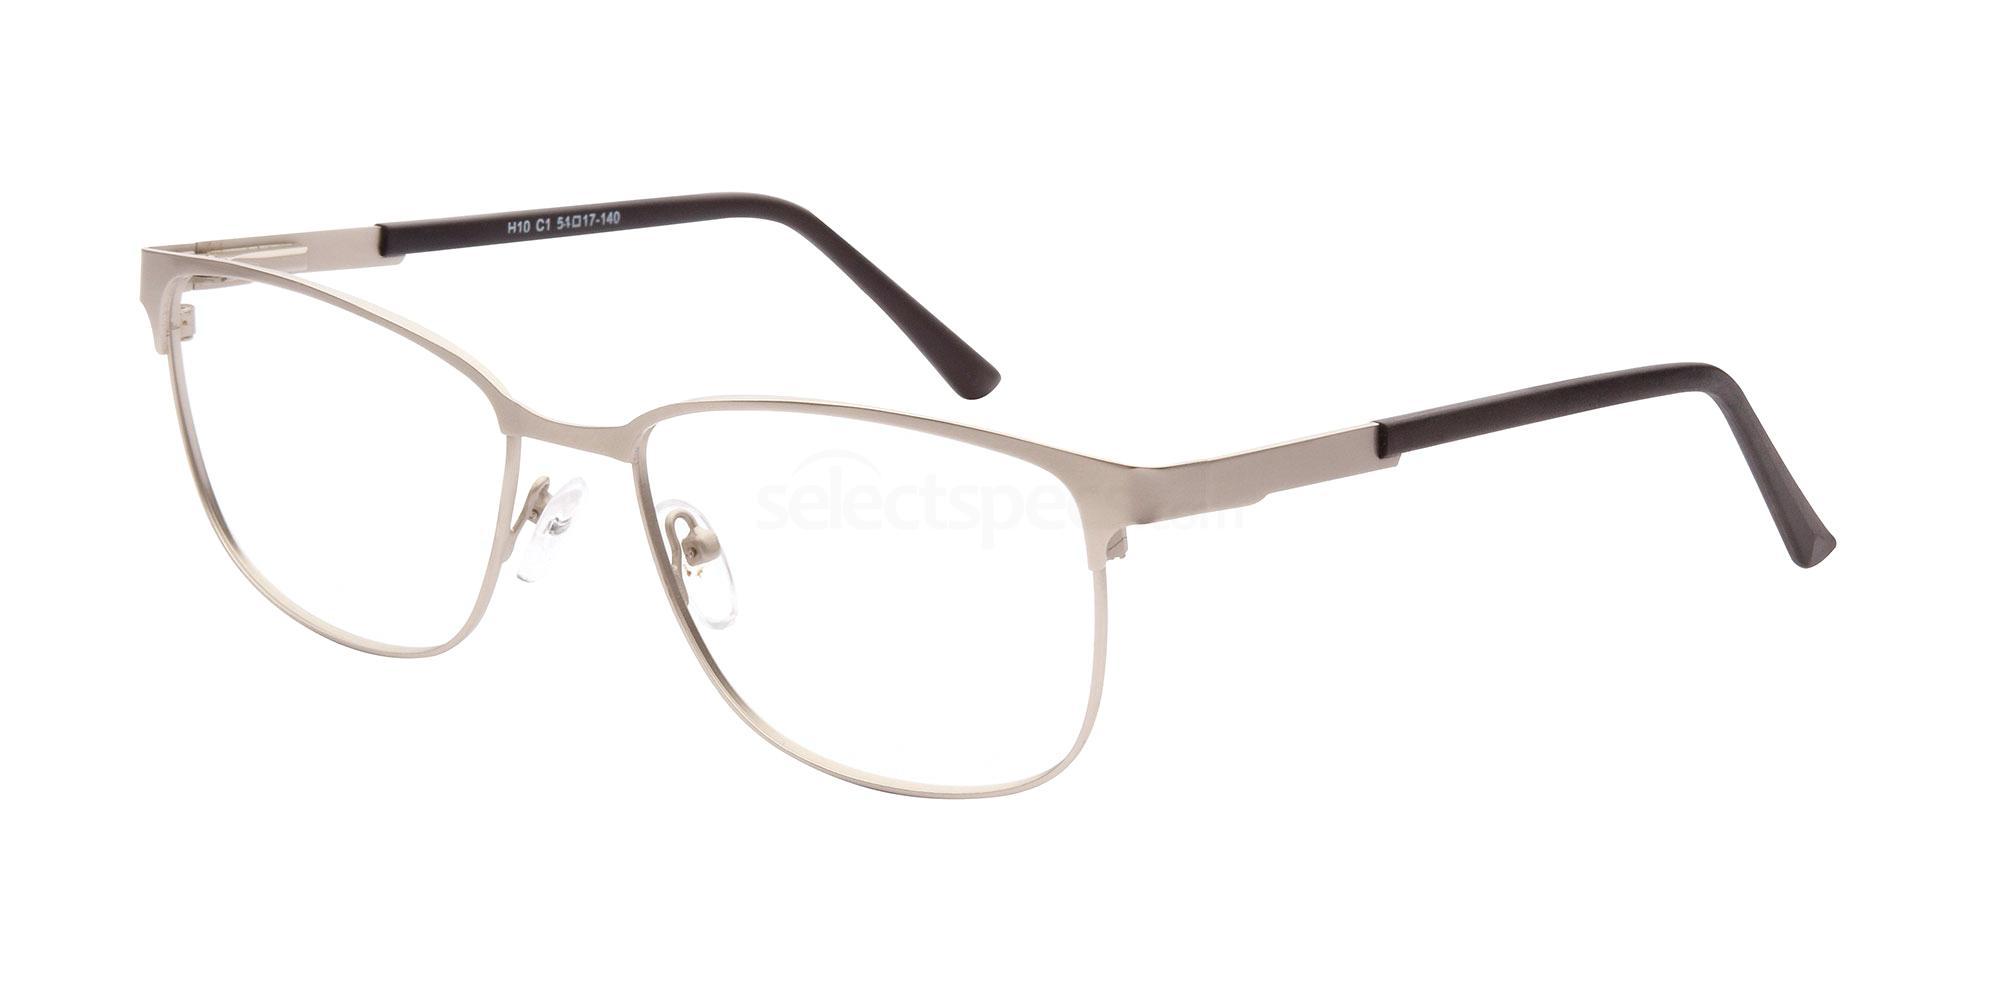 C1 H10 Glasses, Halstrom